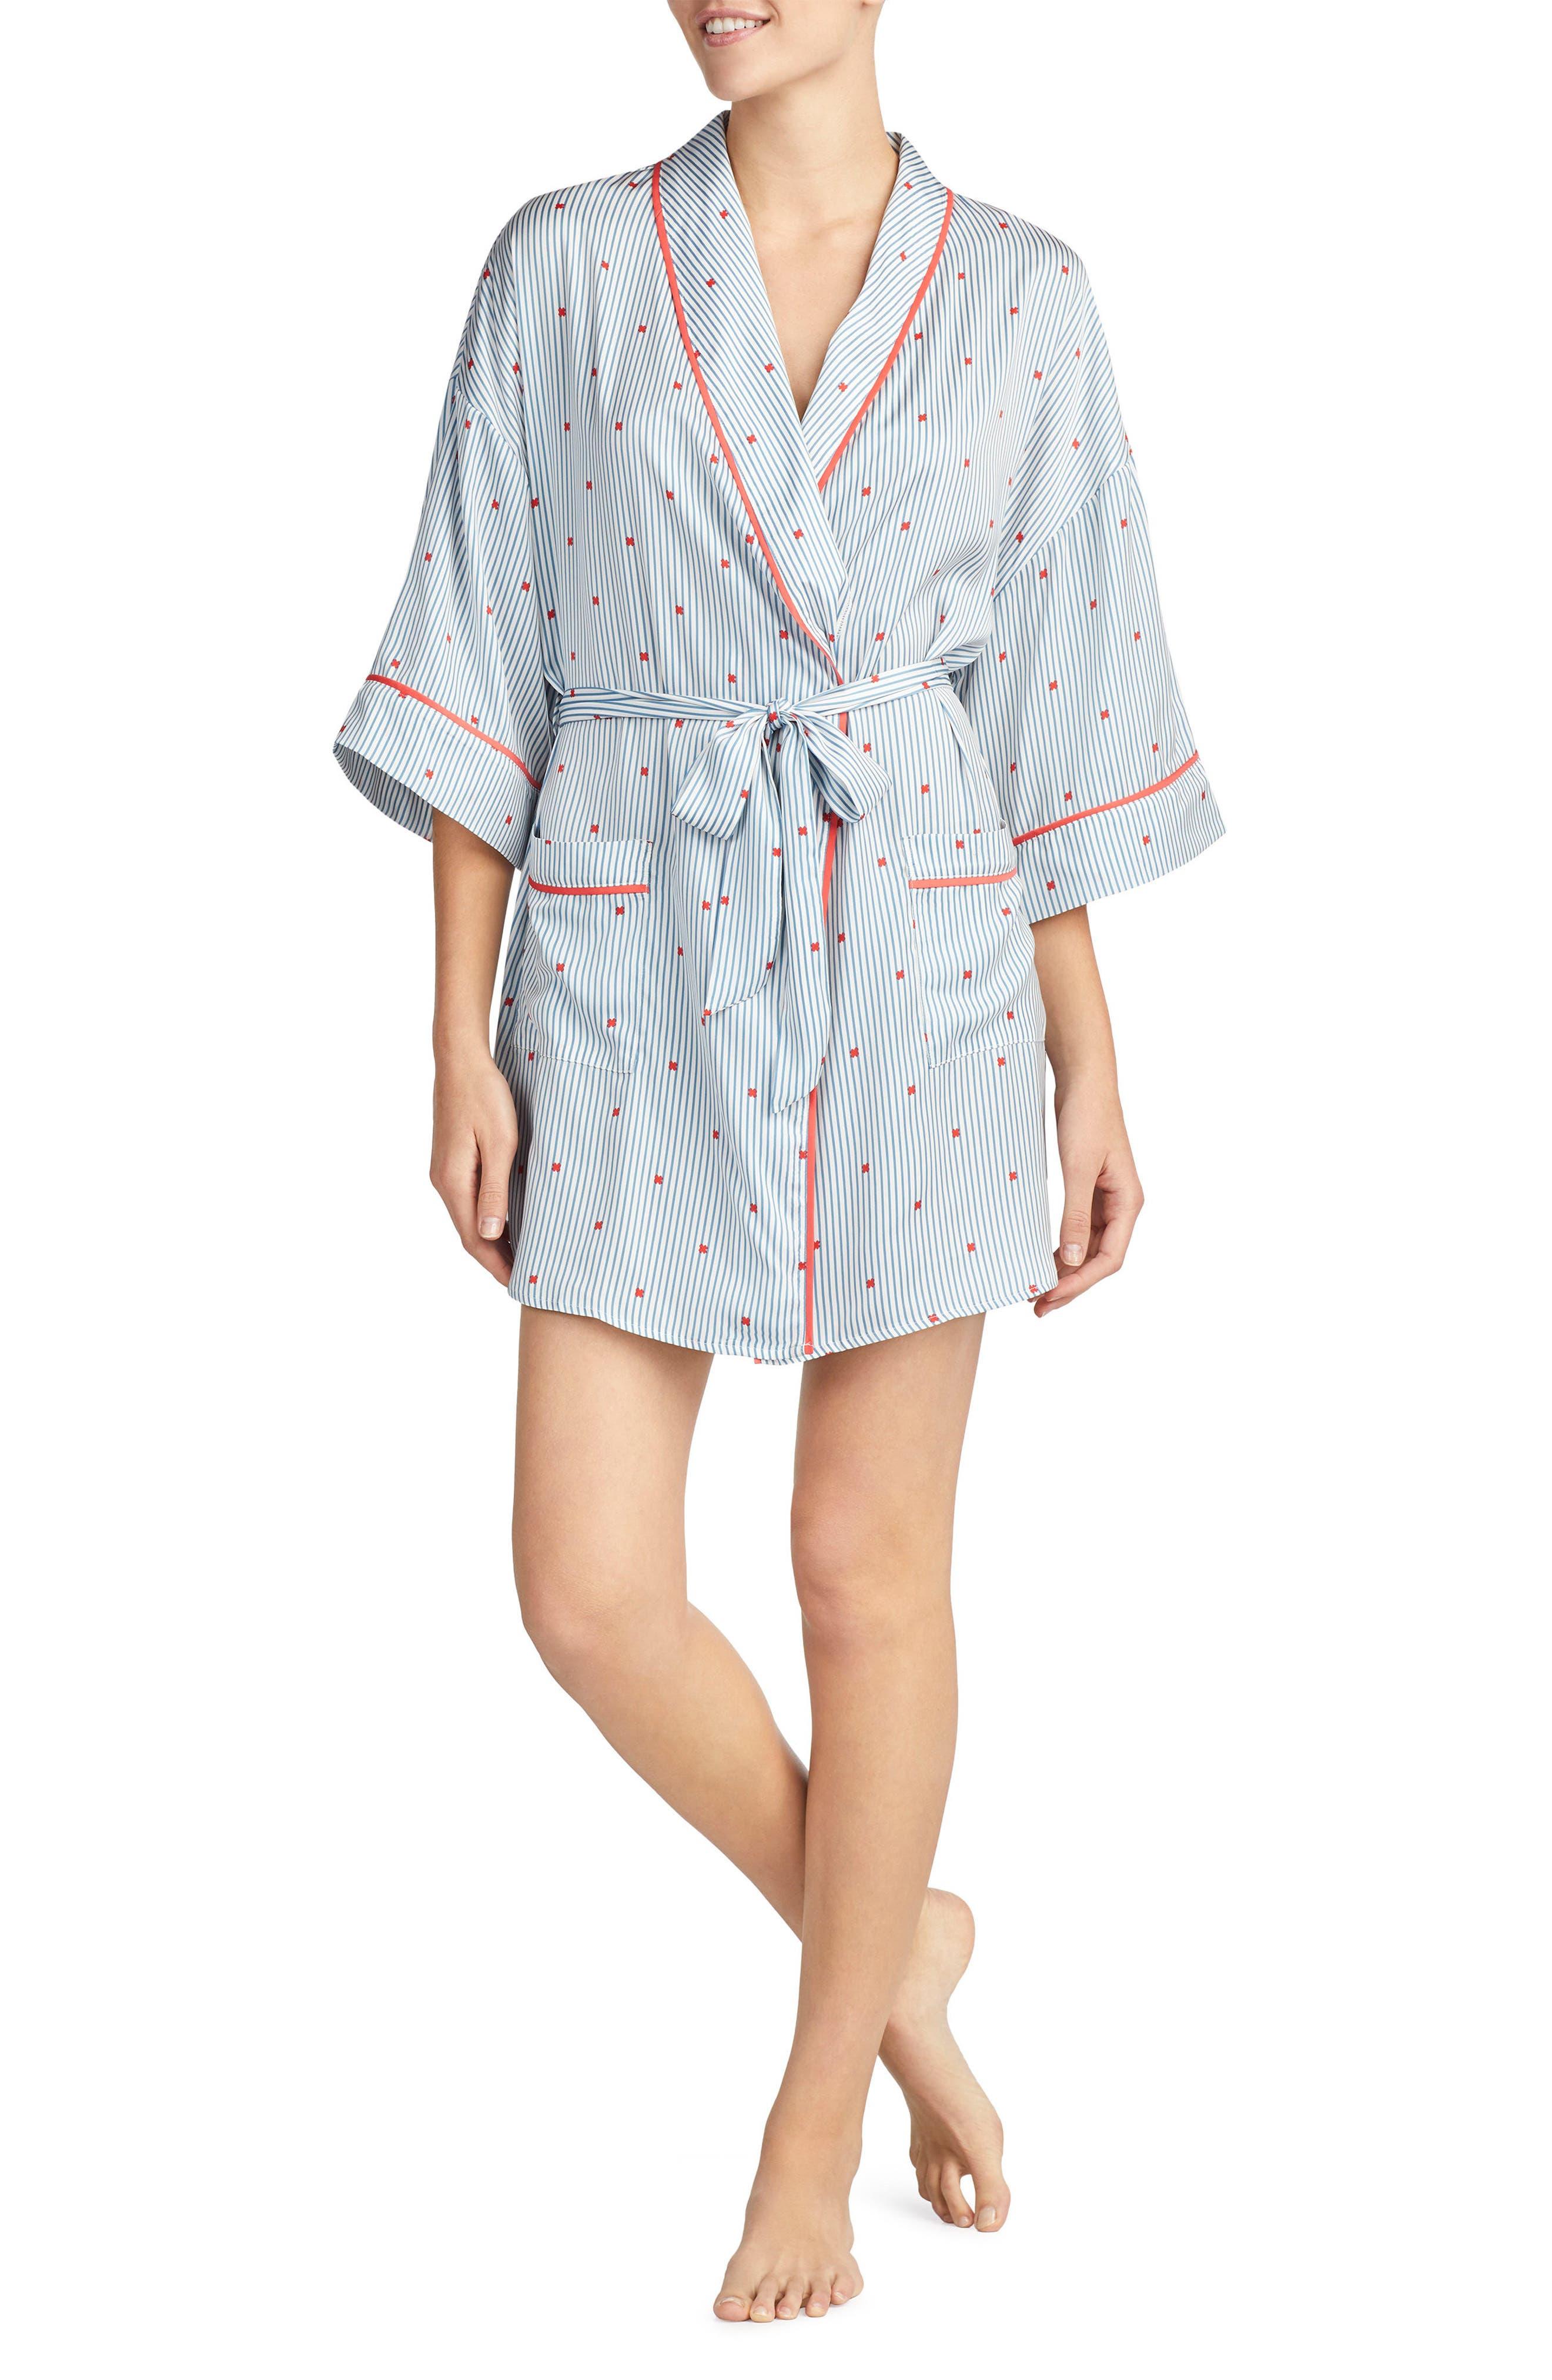 Room Service Satin Short Robe (Nordstrom Exclusive)